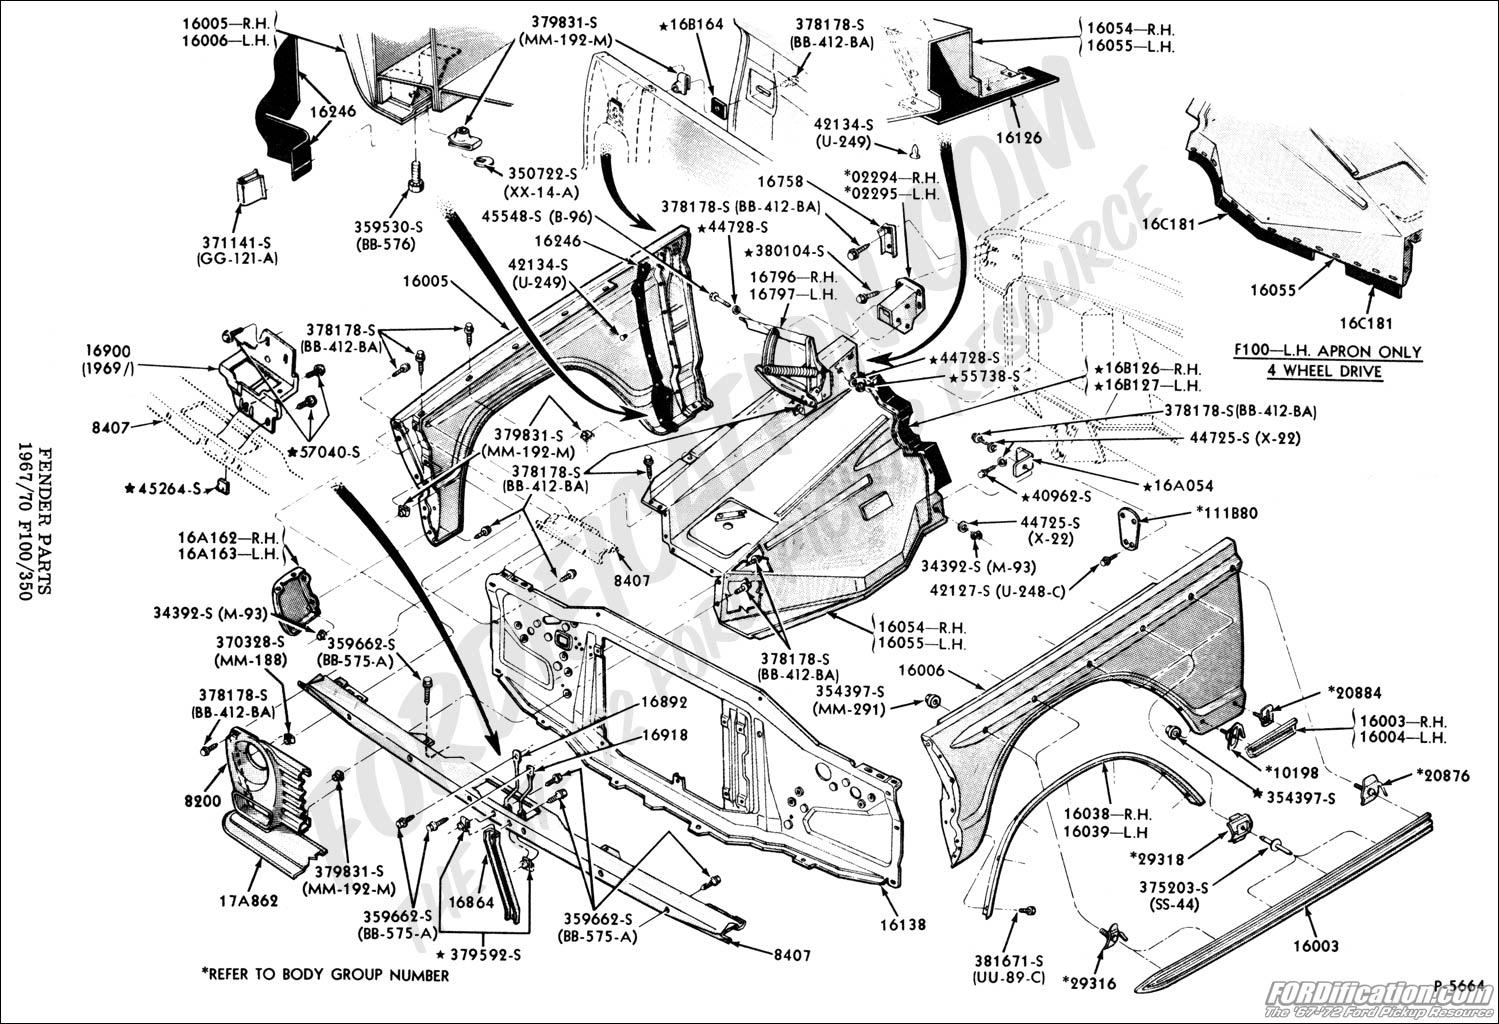 2002 ford ranger frame parts diagram framesite co ford f-250 wiring diagram  2000 ford